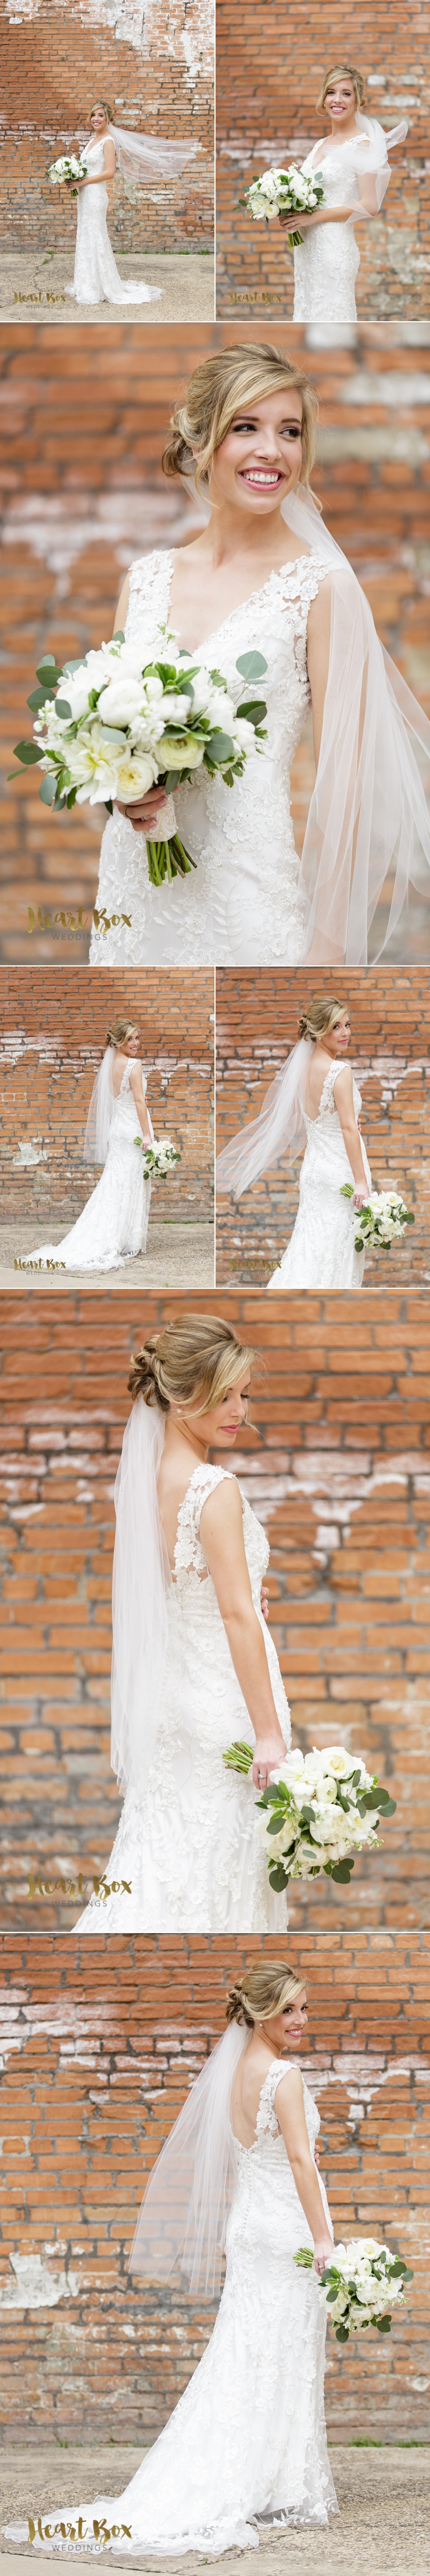 Popplewell Wedding Blog Collages 7.jpg